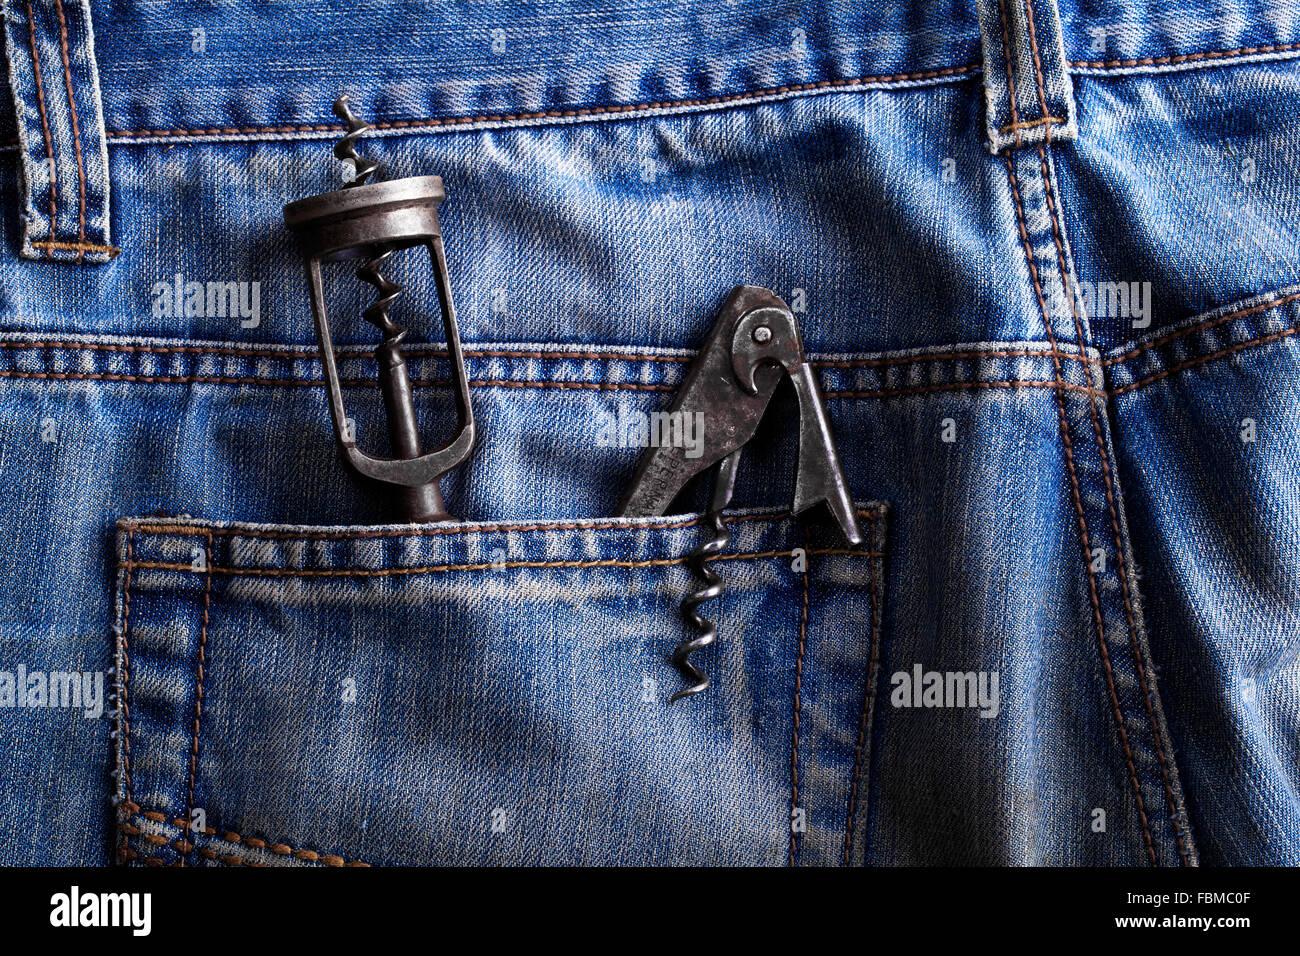 Old corkscrew, bottle opener in the pocket of jeans - Stock Image